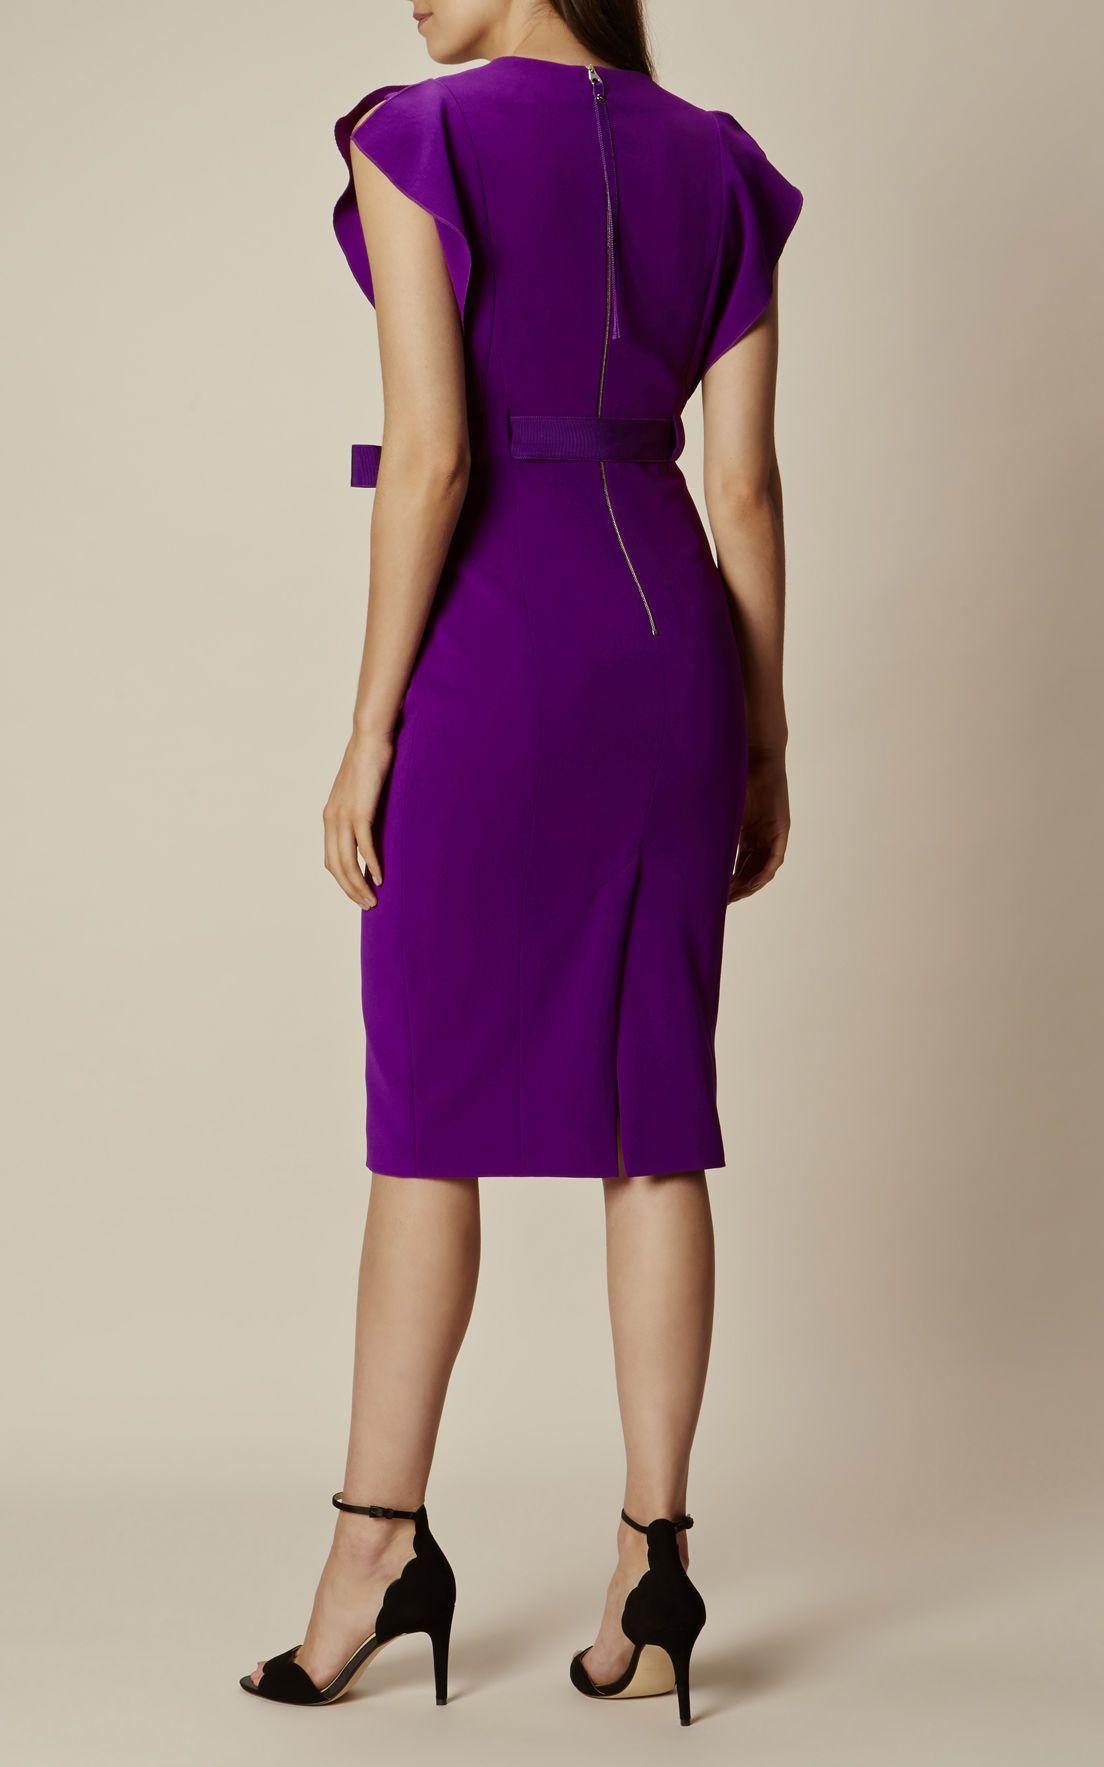 2ea2d5b6e Karen Millen, FRILL PENCIL DRESS Purple | km in 2019 | Dresses ...